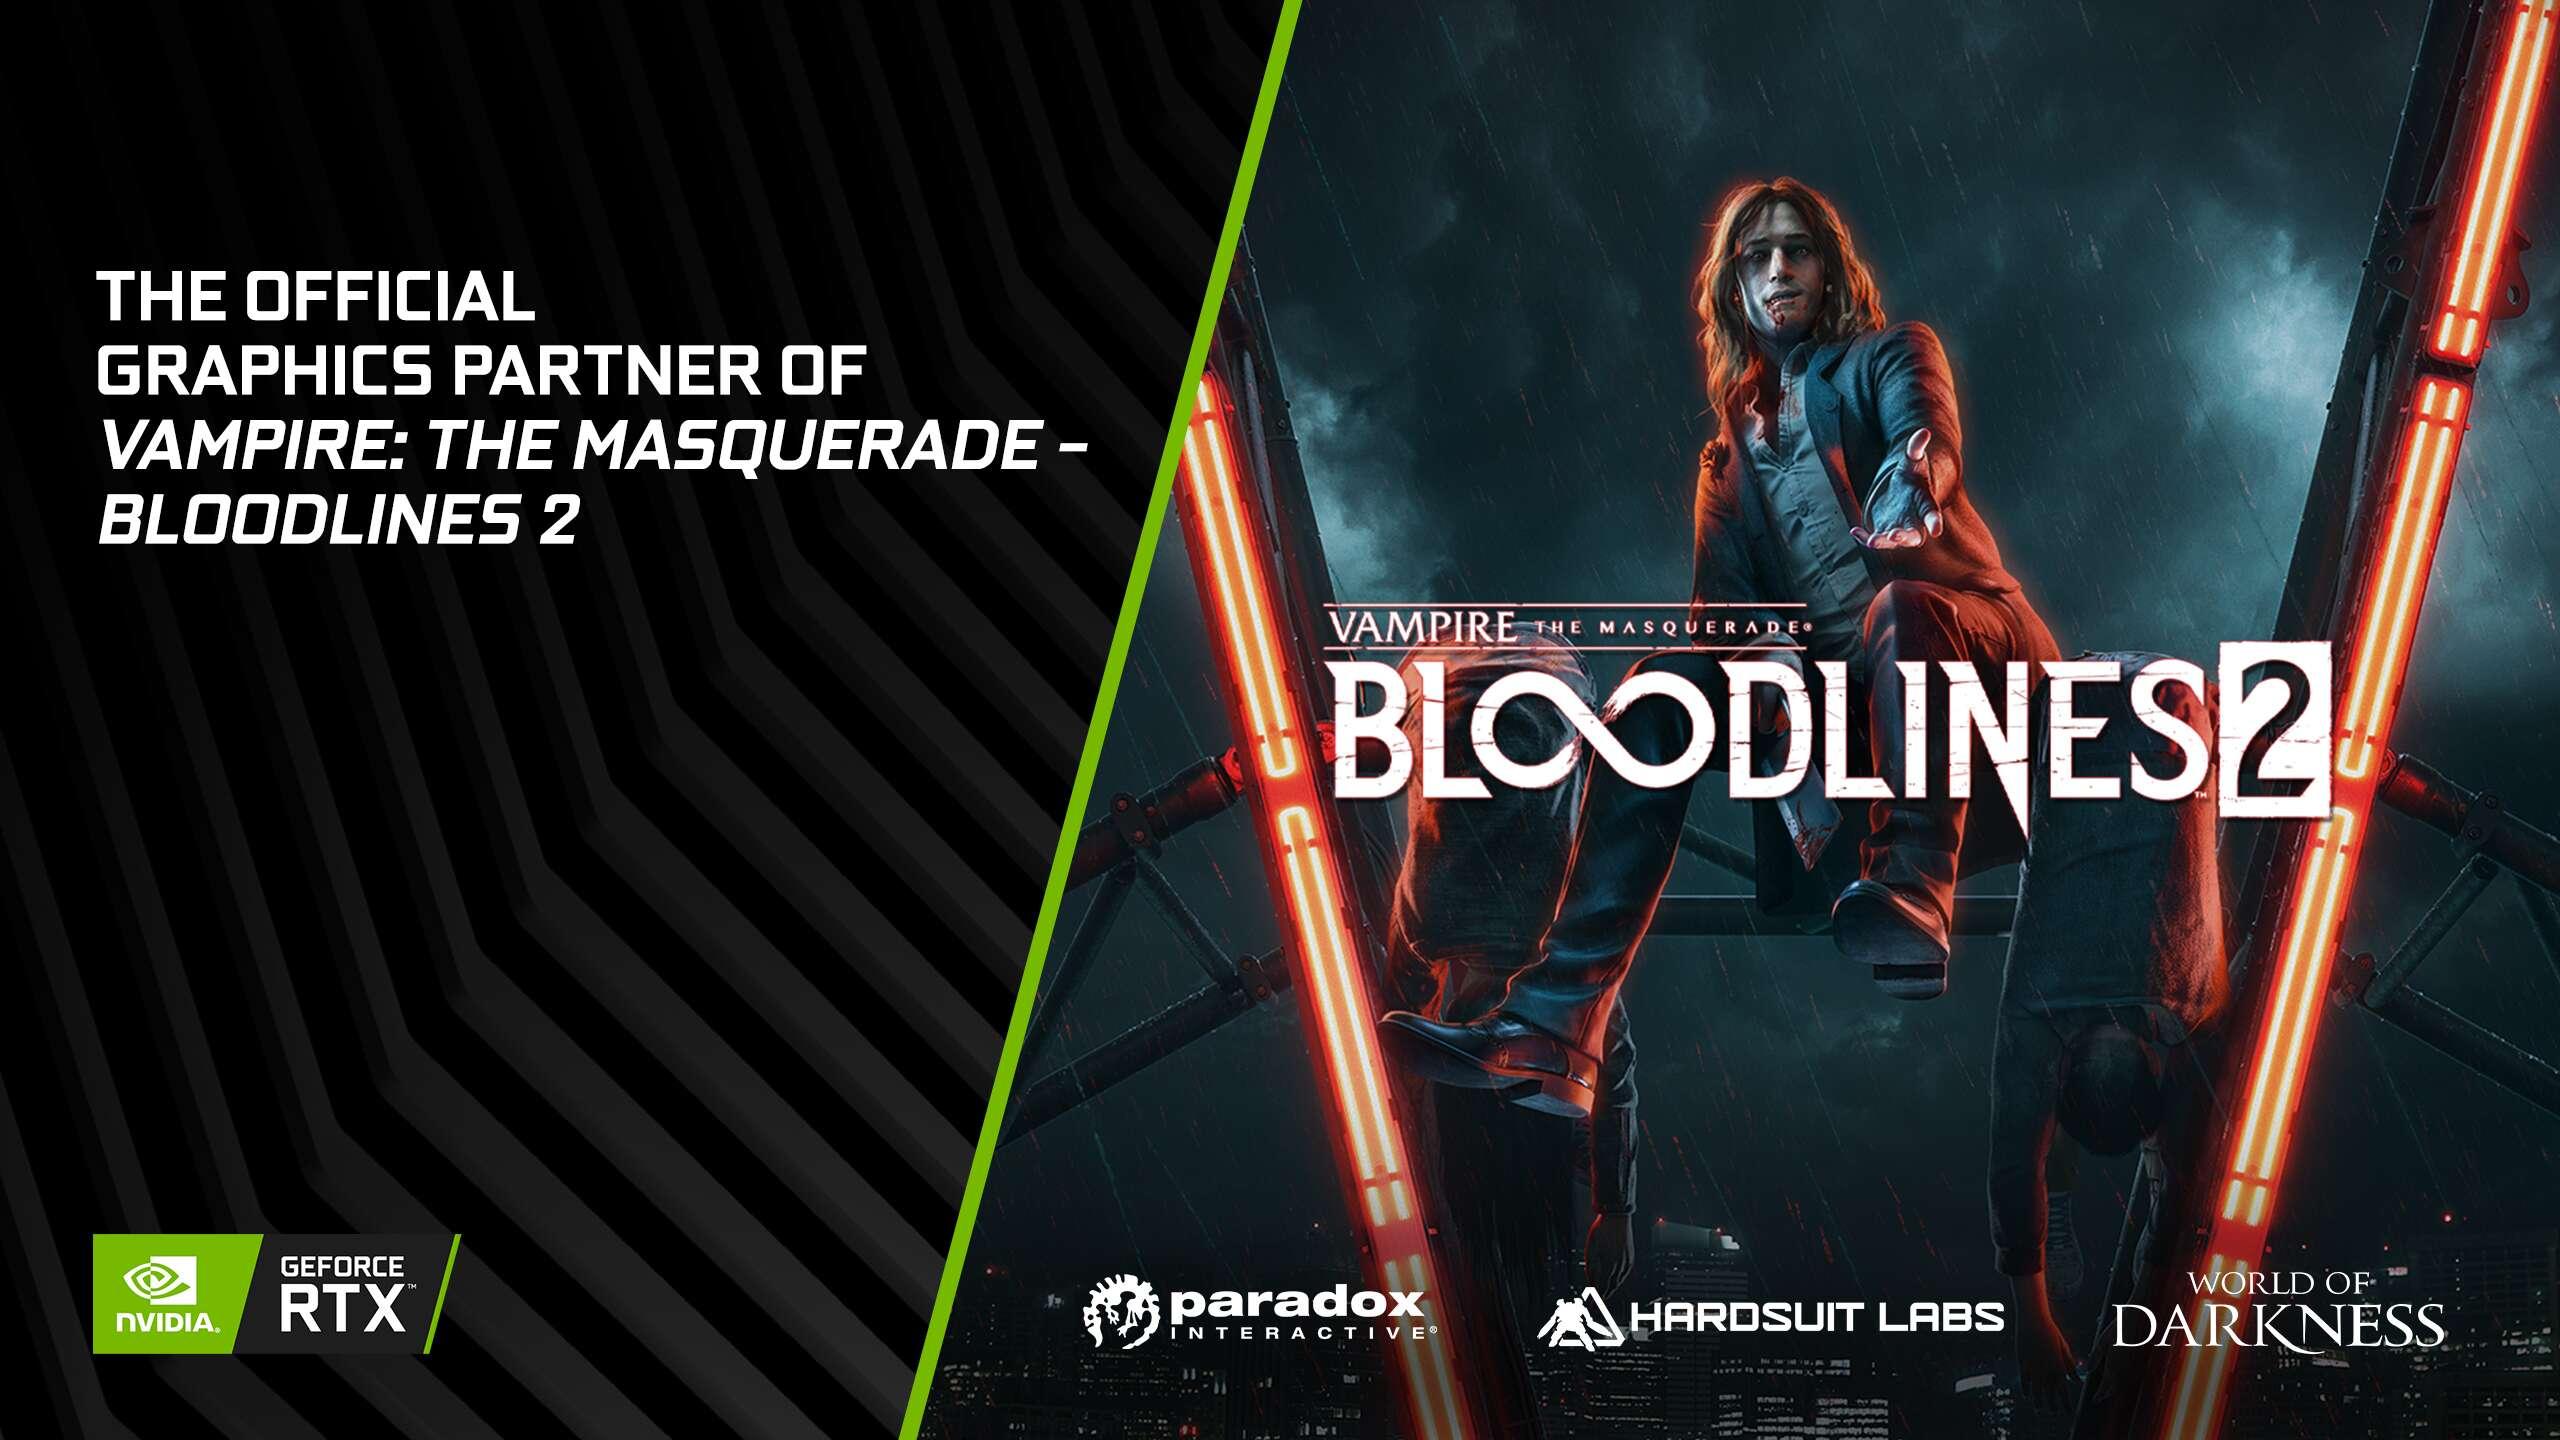 Vampire The Masquerade Bloodlines 2 brief, gameplay